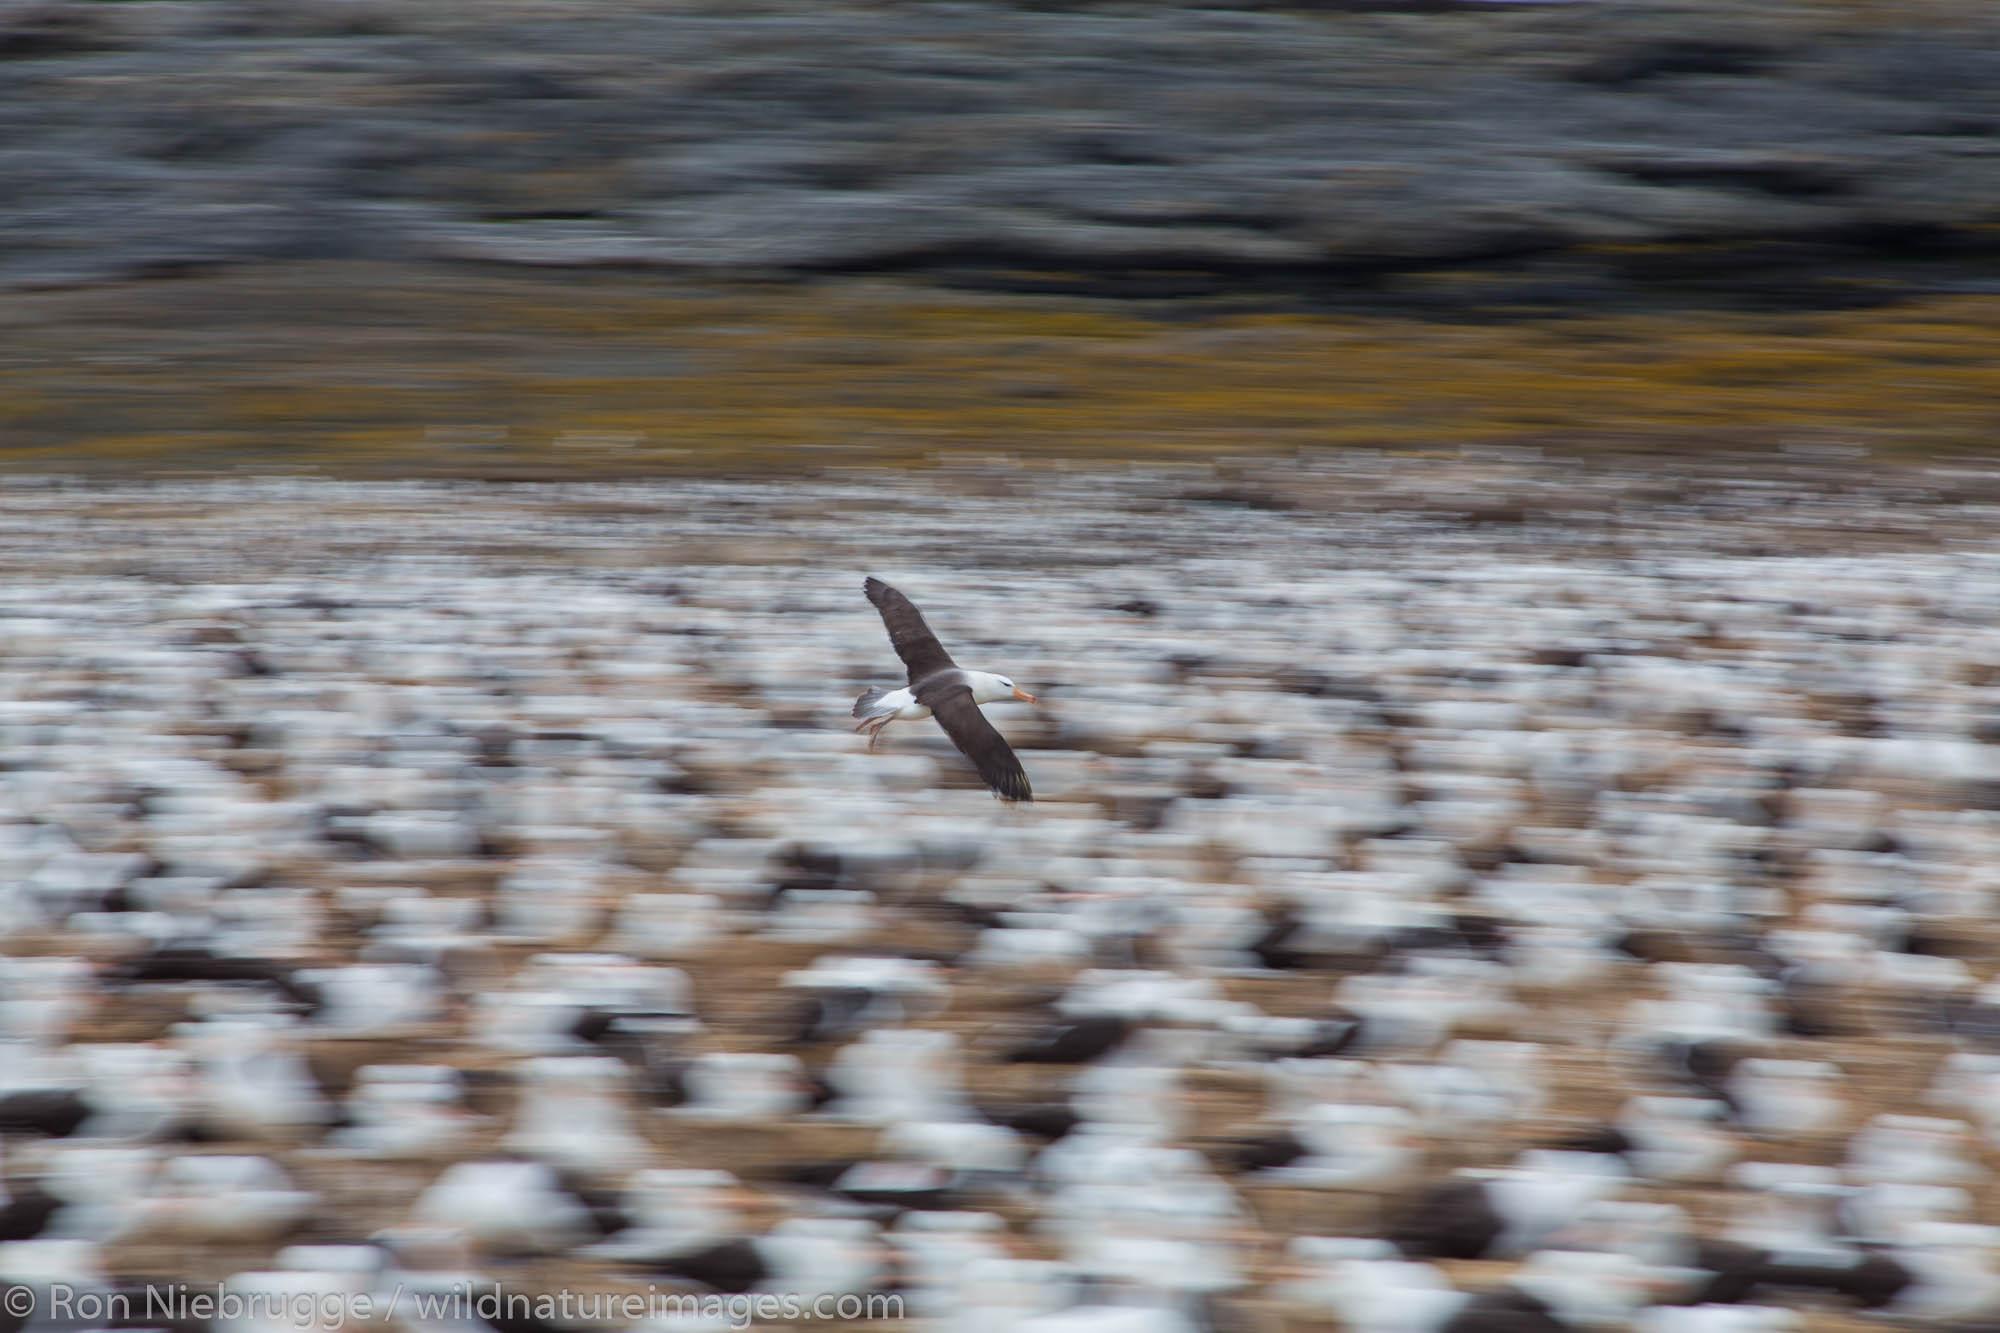 Black-browed albatross colony, Steeple Jason Island, Falklands.